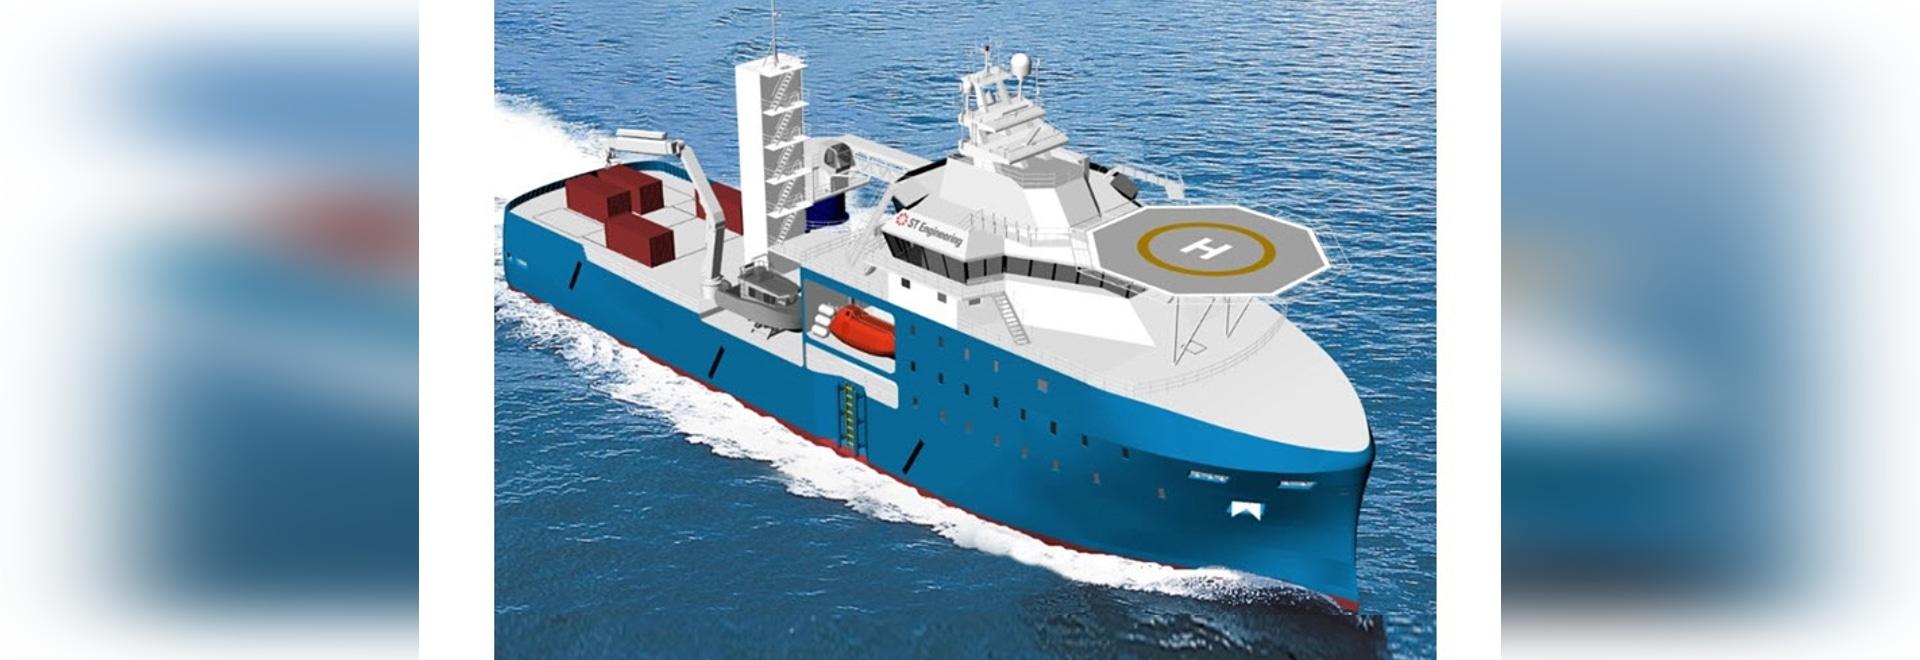 SOV is based on ST Engineering's innovative Eco-hull design